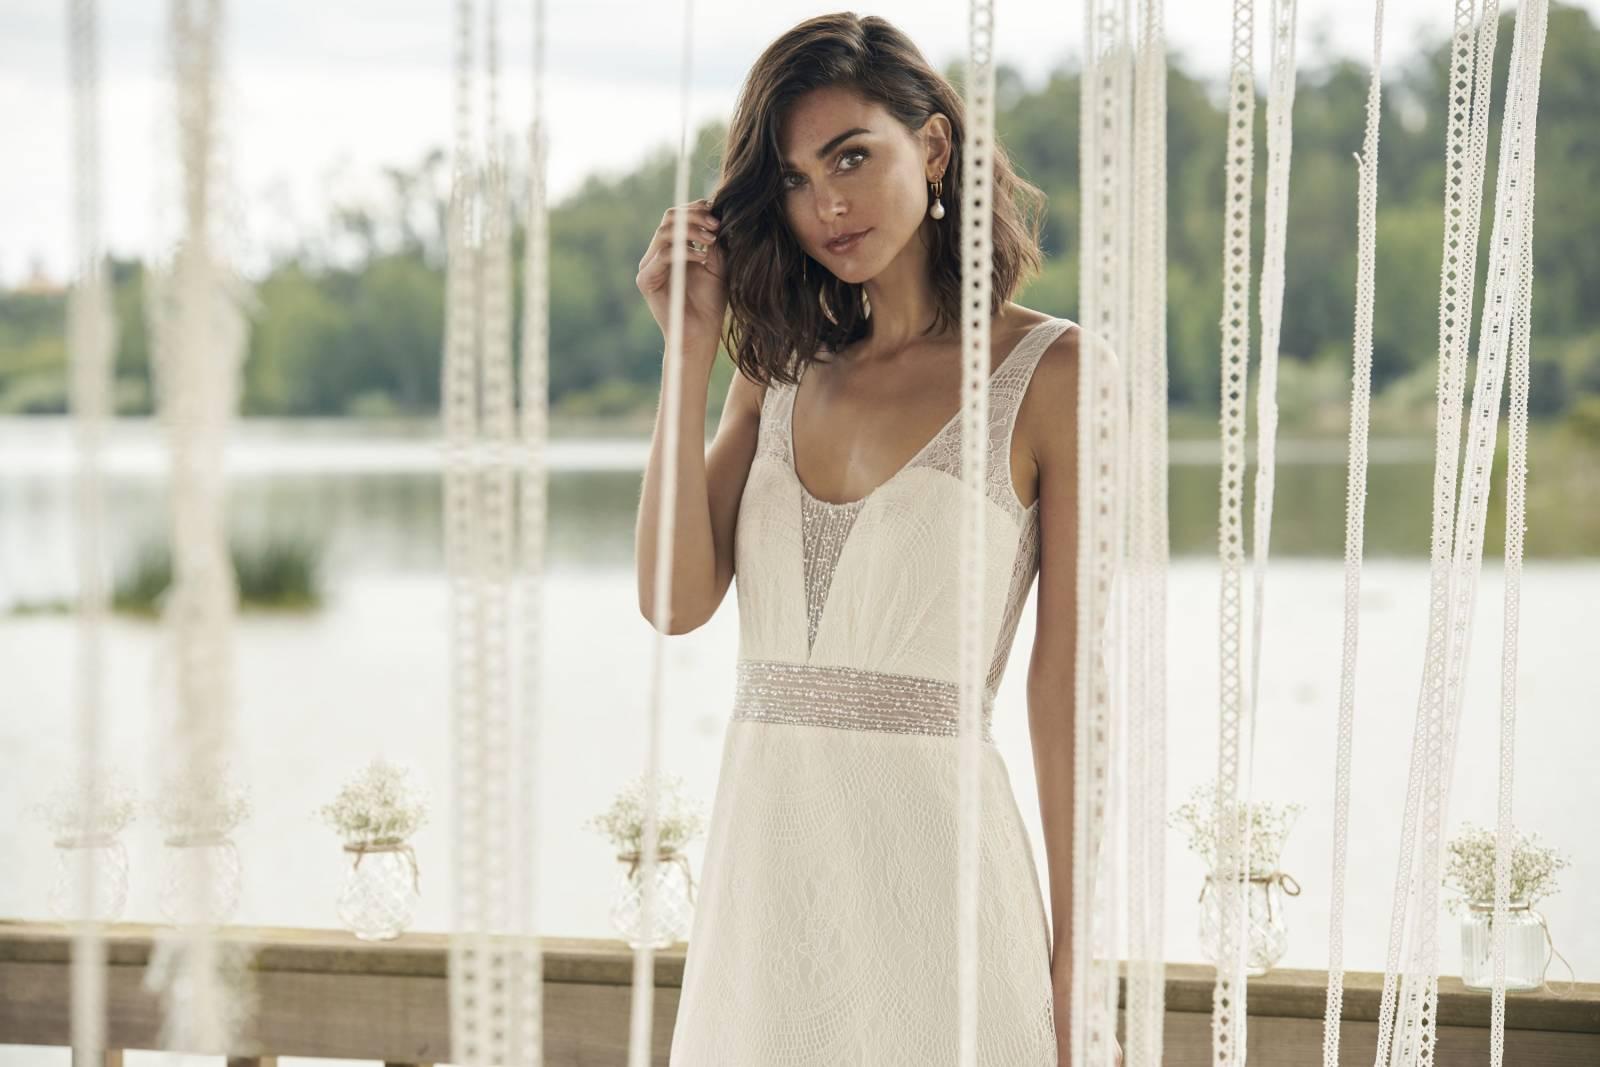 Maxim's Couture - Bruidsmode - Bruidsmodewinkel - Trouwjurk - House of Weddings - 17